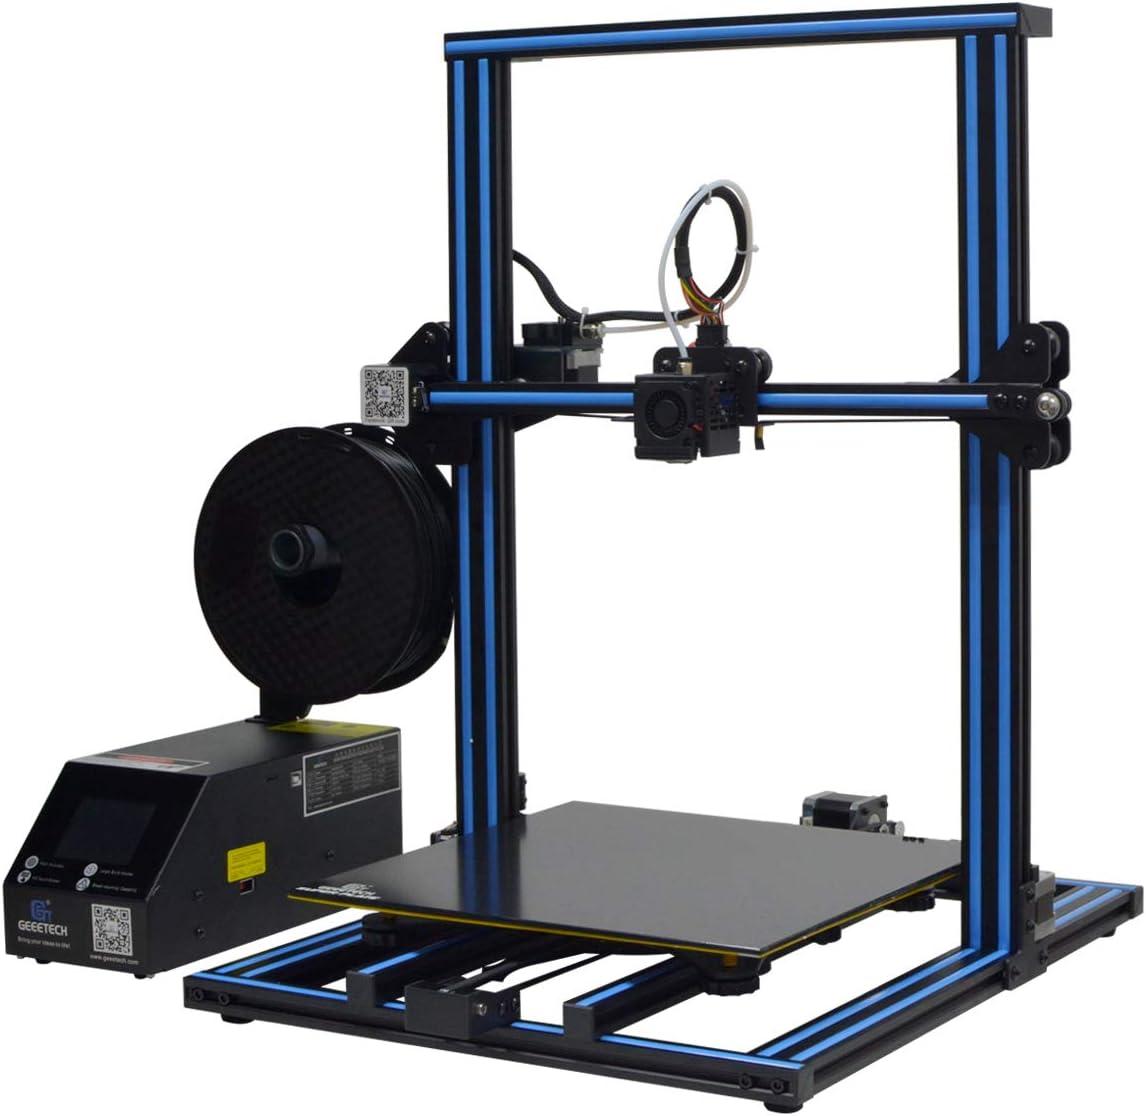 giantarm Geeetech A30 Nueva versión Impresora 3D con Formato de ...